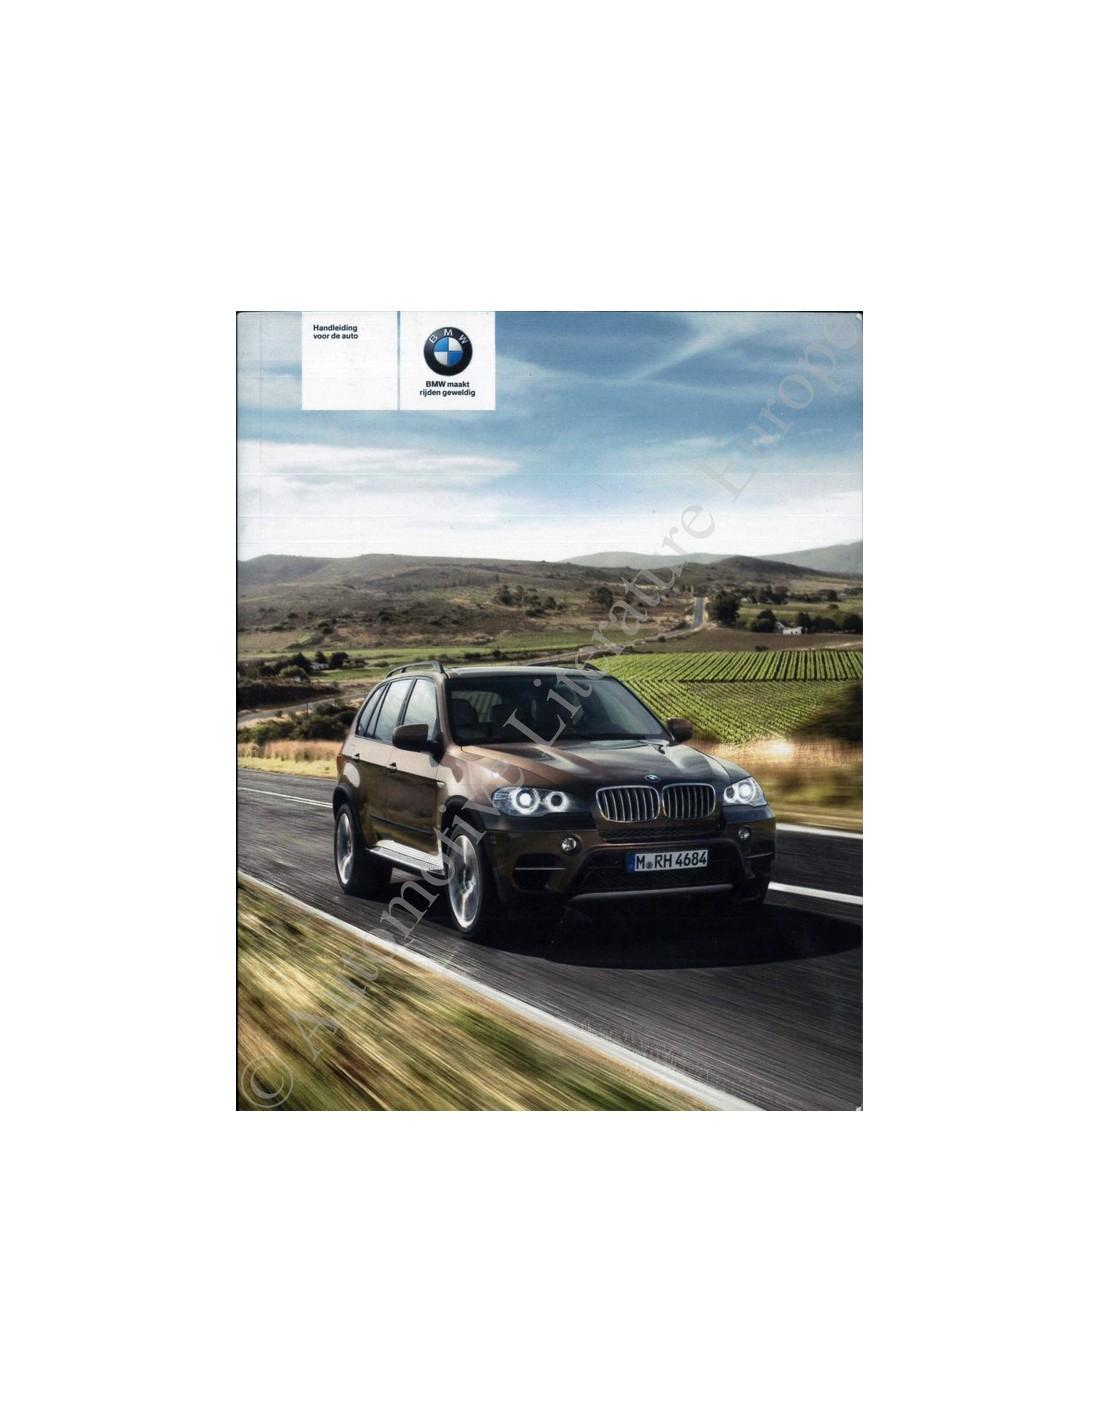 2010 Bmw X6 M Exterior: 2010 BMW X5 X6 M INSTRUCTIEBOEKJE NEDERLANDS